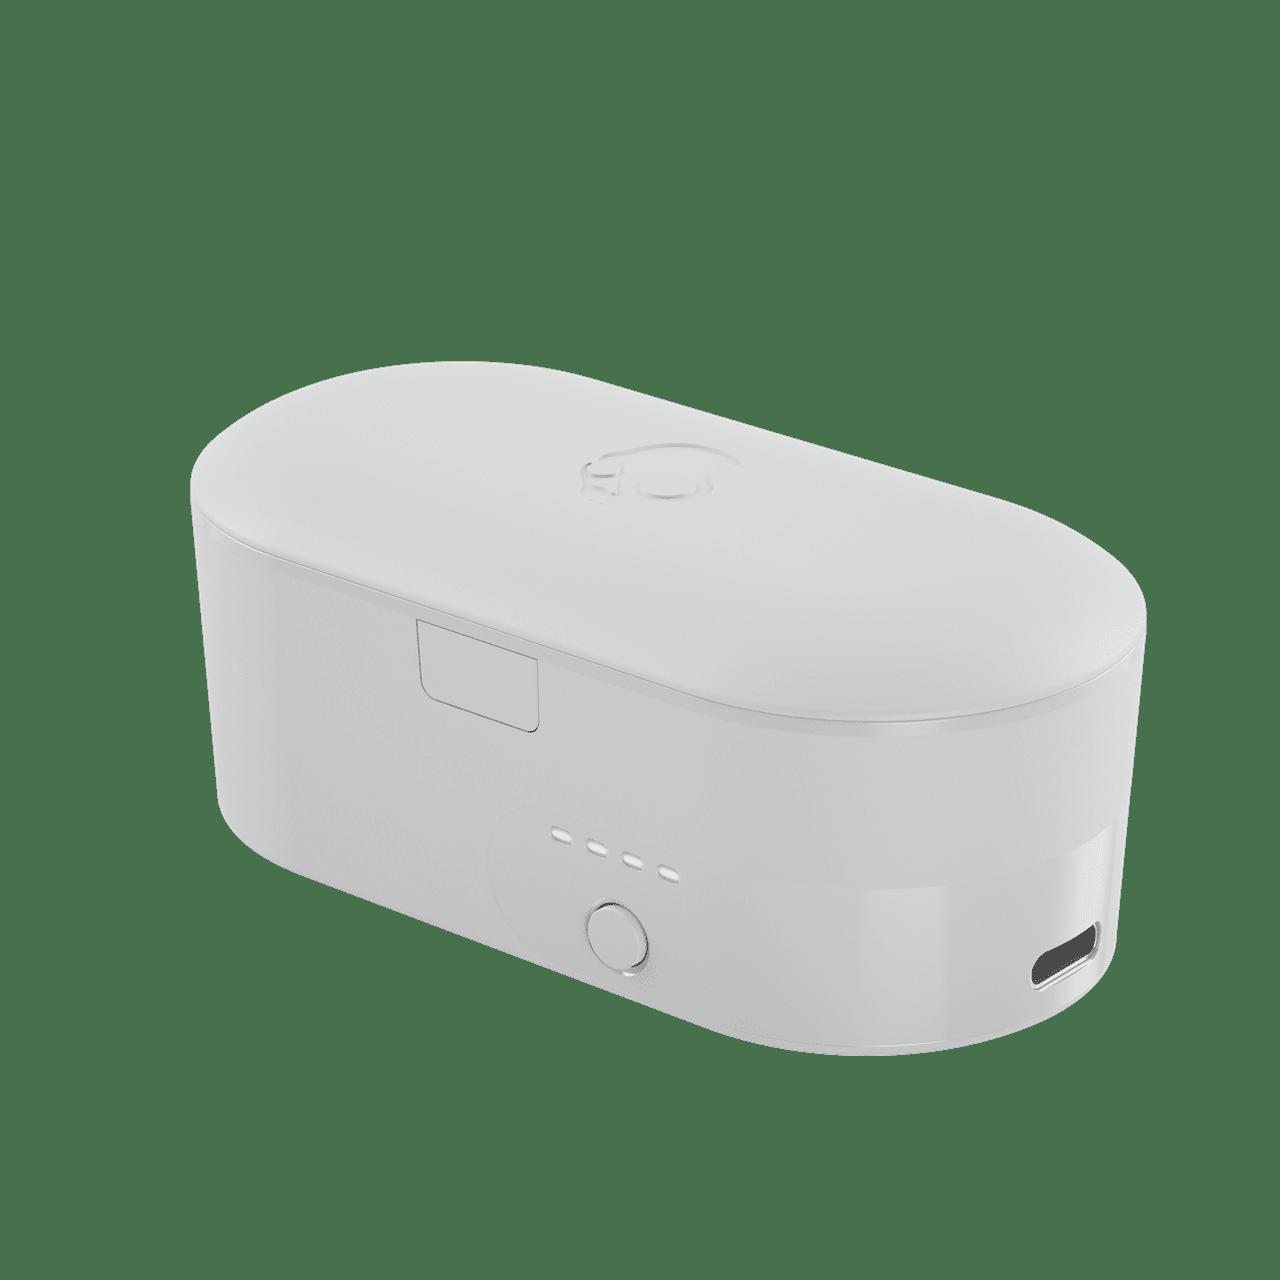 Skullcandy Push Grey Day True Wireless Bluetooth Earphones - 3